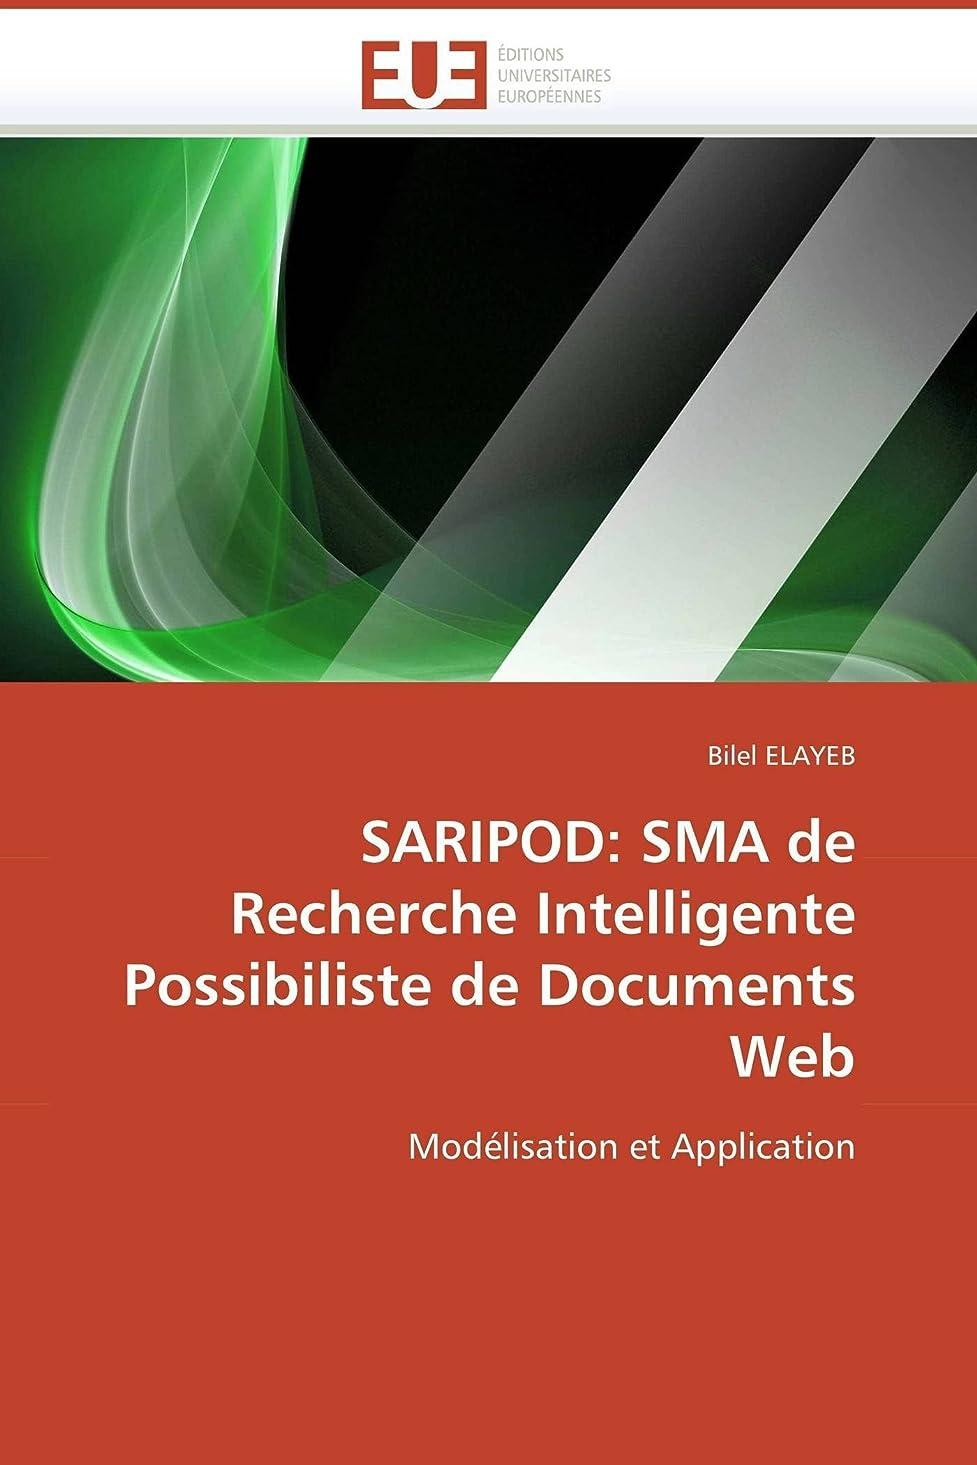 社交的火星薬を飲むSaripod: Sma de Recherche Intelligente Possibiliste de Documents Web (Omn.Univ.Europ.)